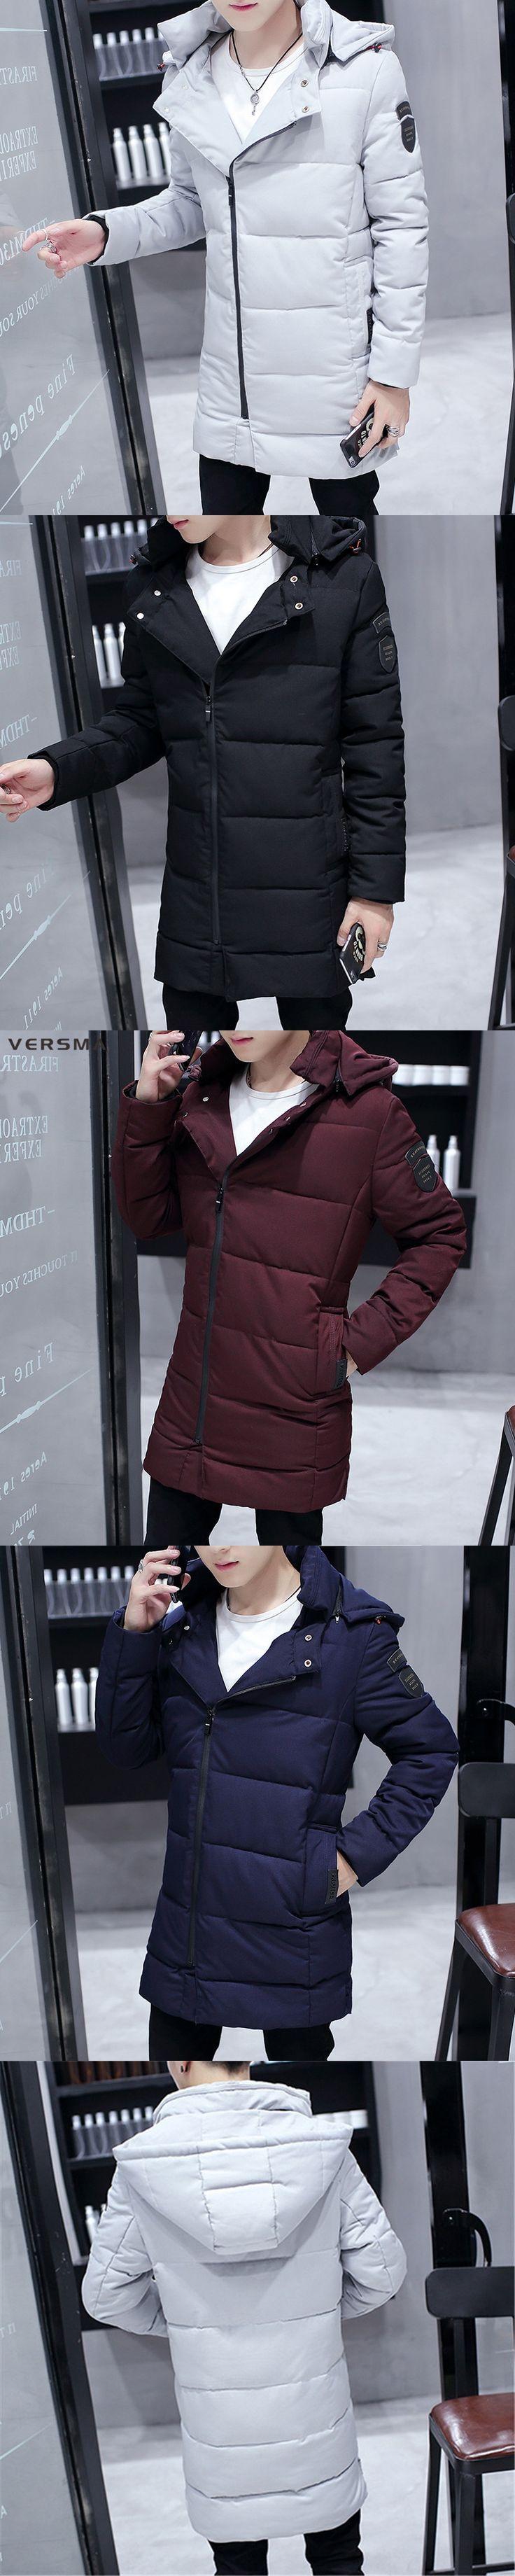 VERSMA Korean Slim Fit Canada Winter Men Parka Jacket Coat for Teenager Warm Casual Puffy Russian Mens Winter Jackets Parkas Men